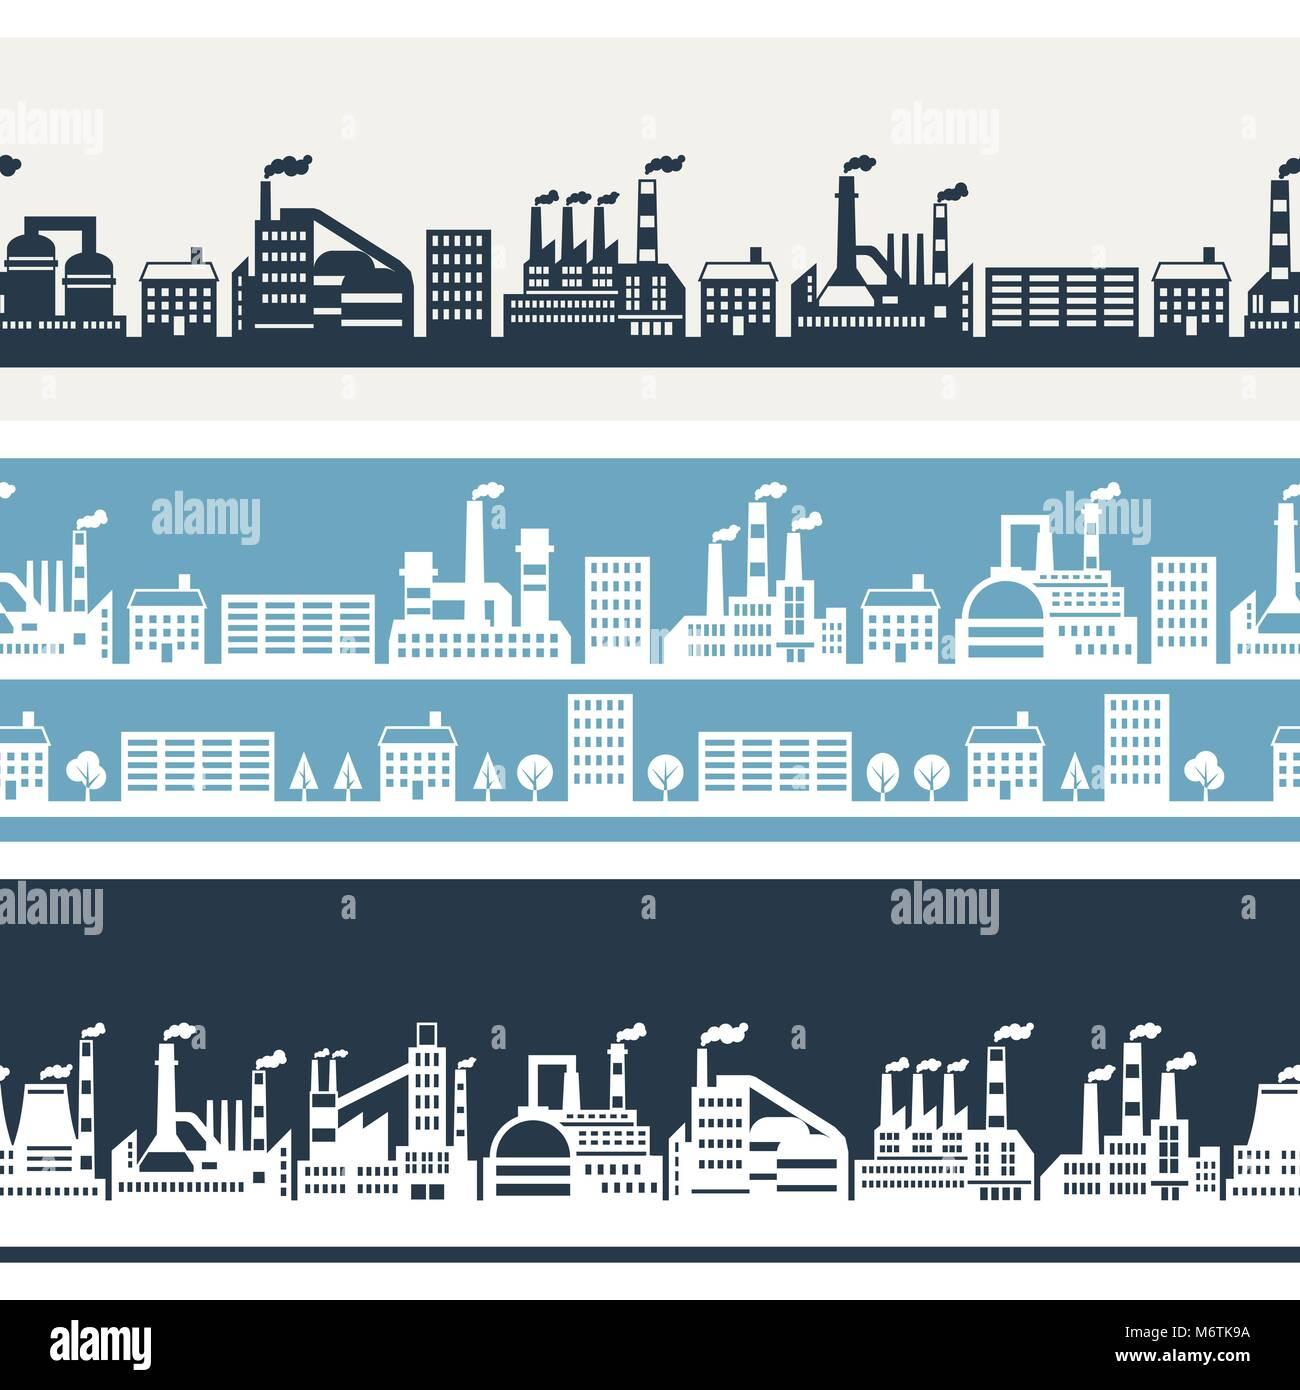 Industrial factory buildings horizontal banners - Stock Vector